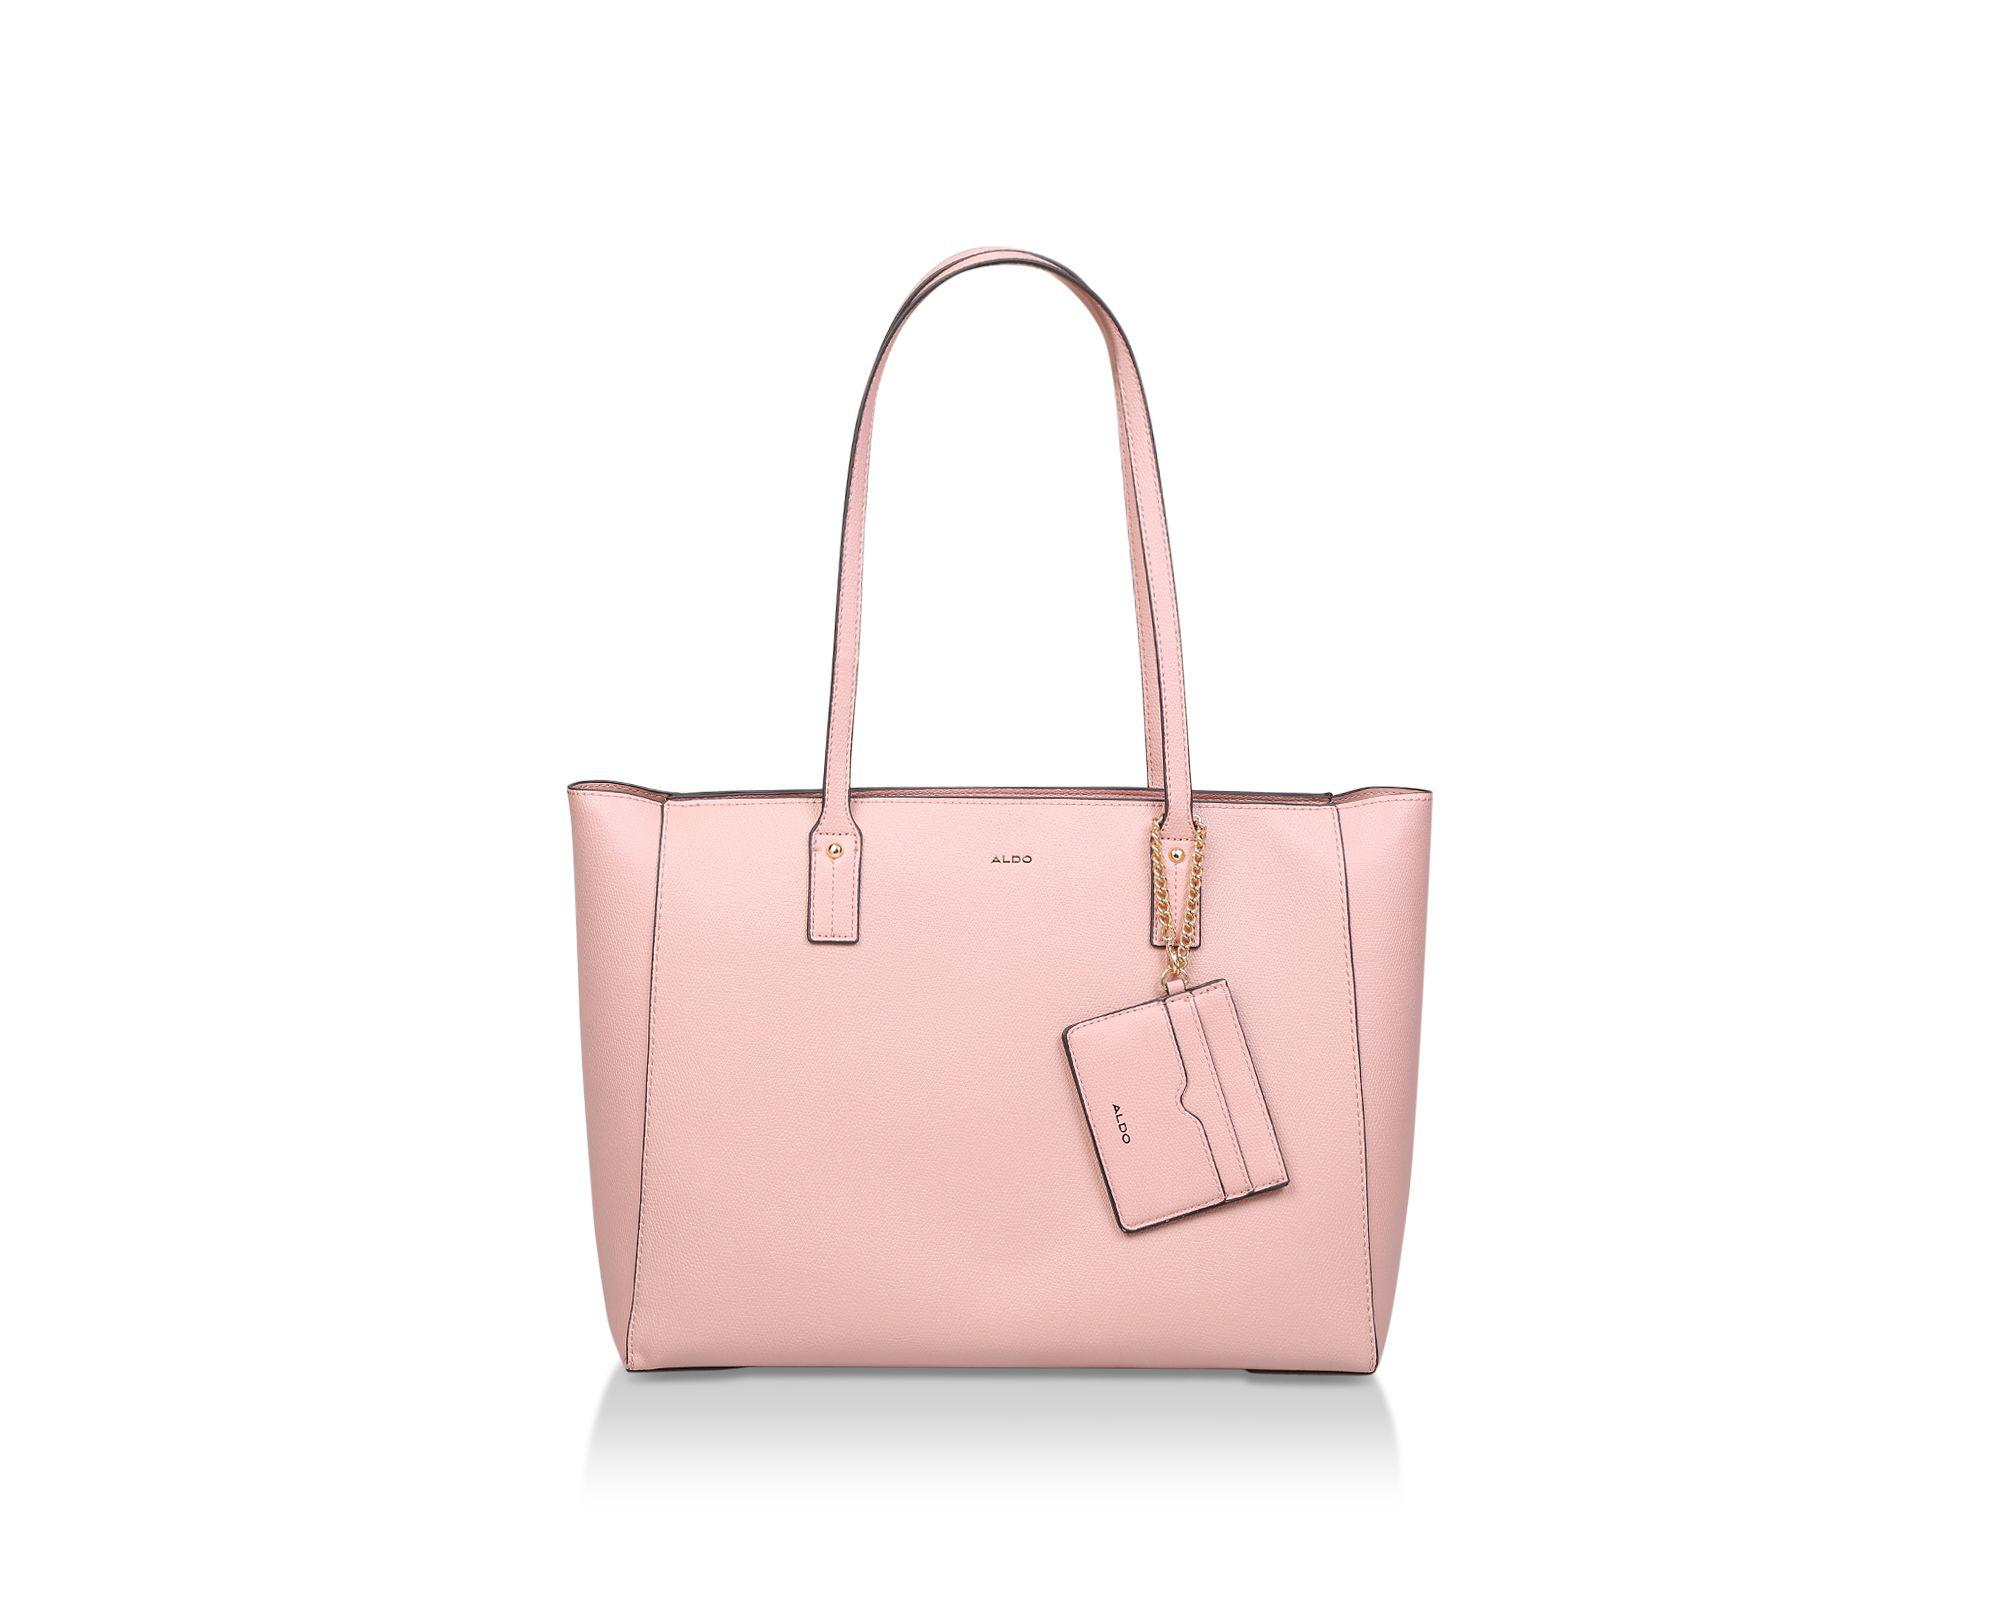 bbf54aa50da ALDO Pink  pomona  Tote Bag in Pink - Lyst